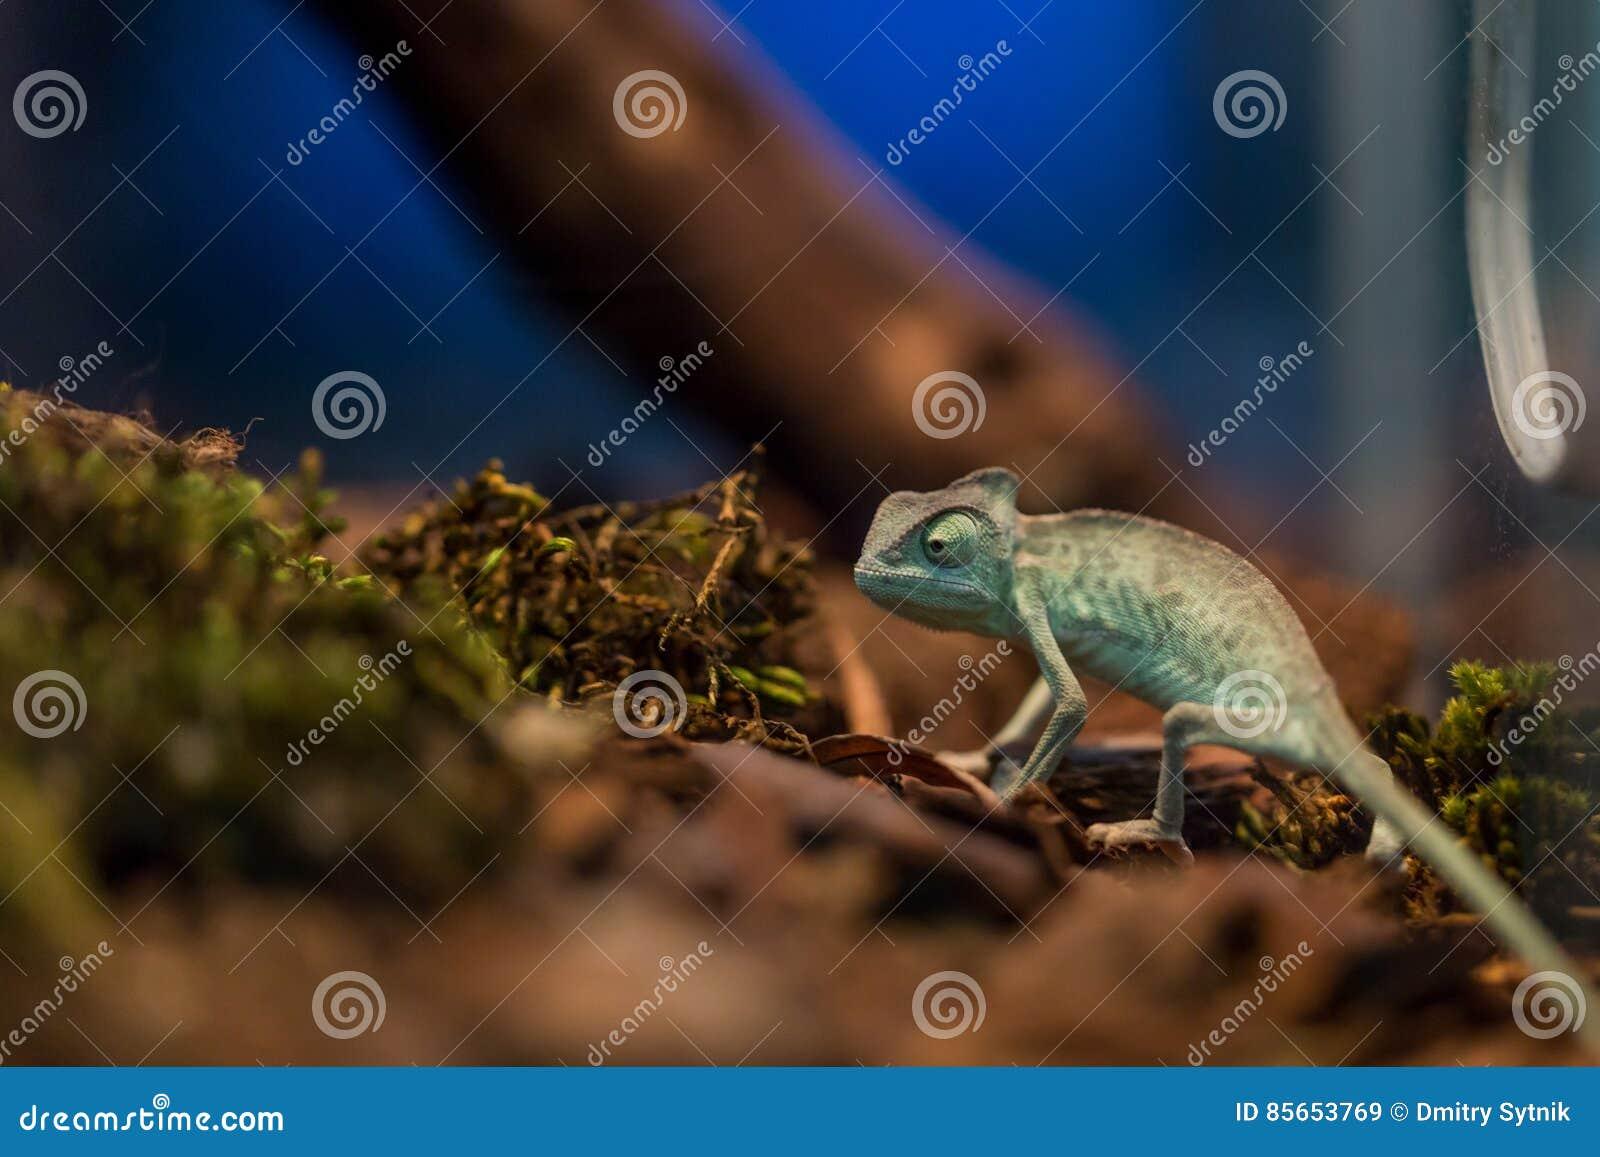 Small Lizard In Terrarium For Home Decor Stock Image Image Of Skin